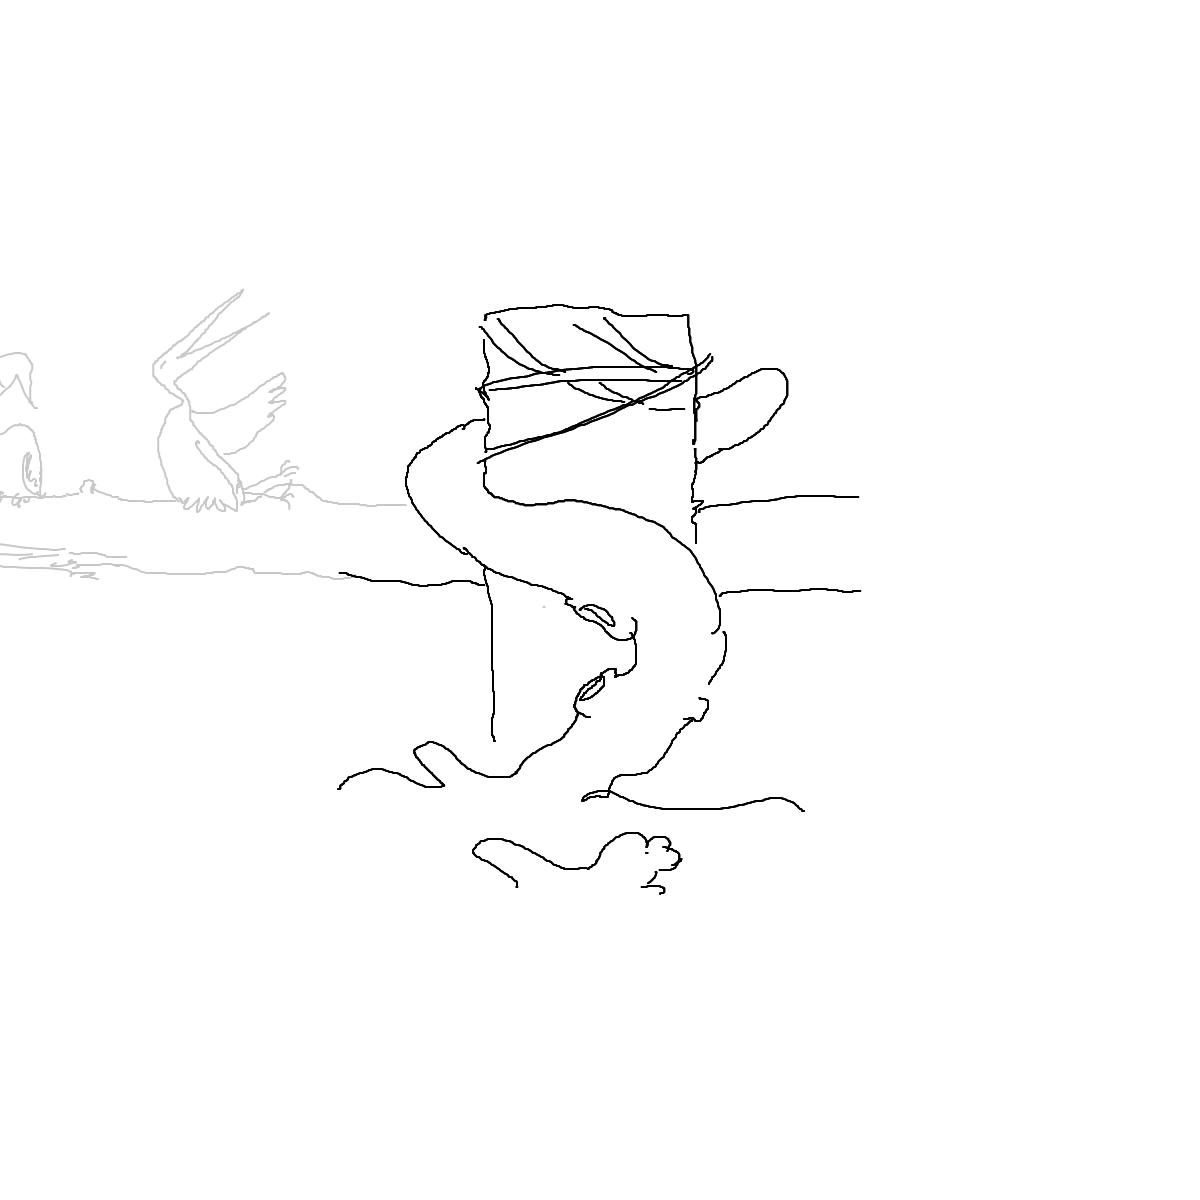 BAAAM drawing#22077 lat:78.4174575805664000lng: -4.4293532371521000